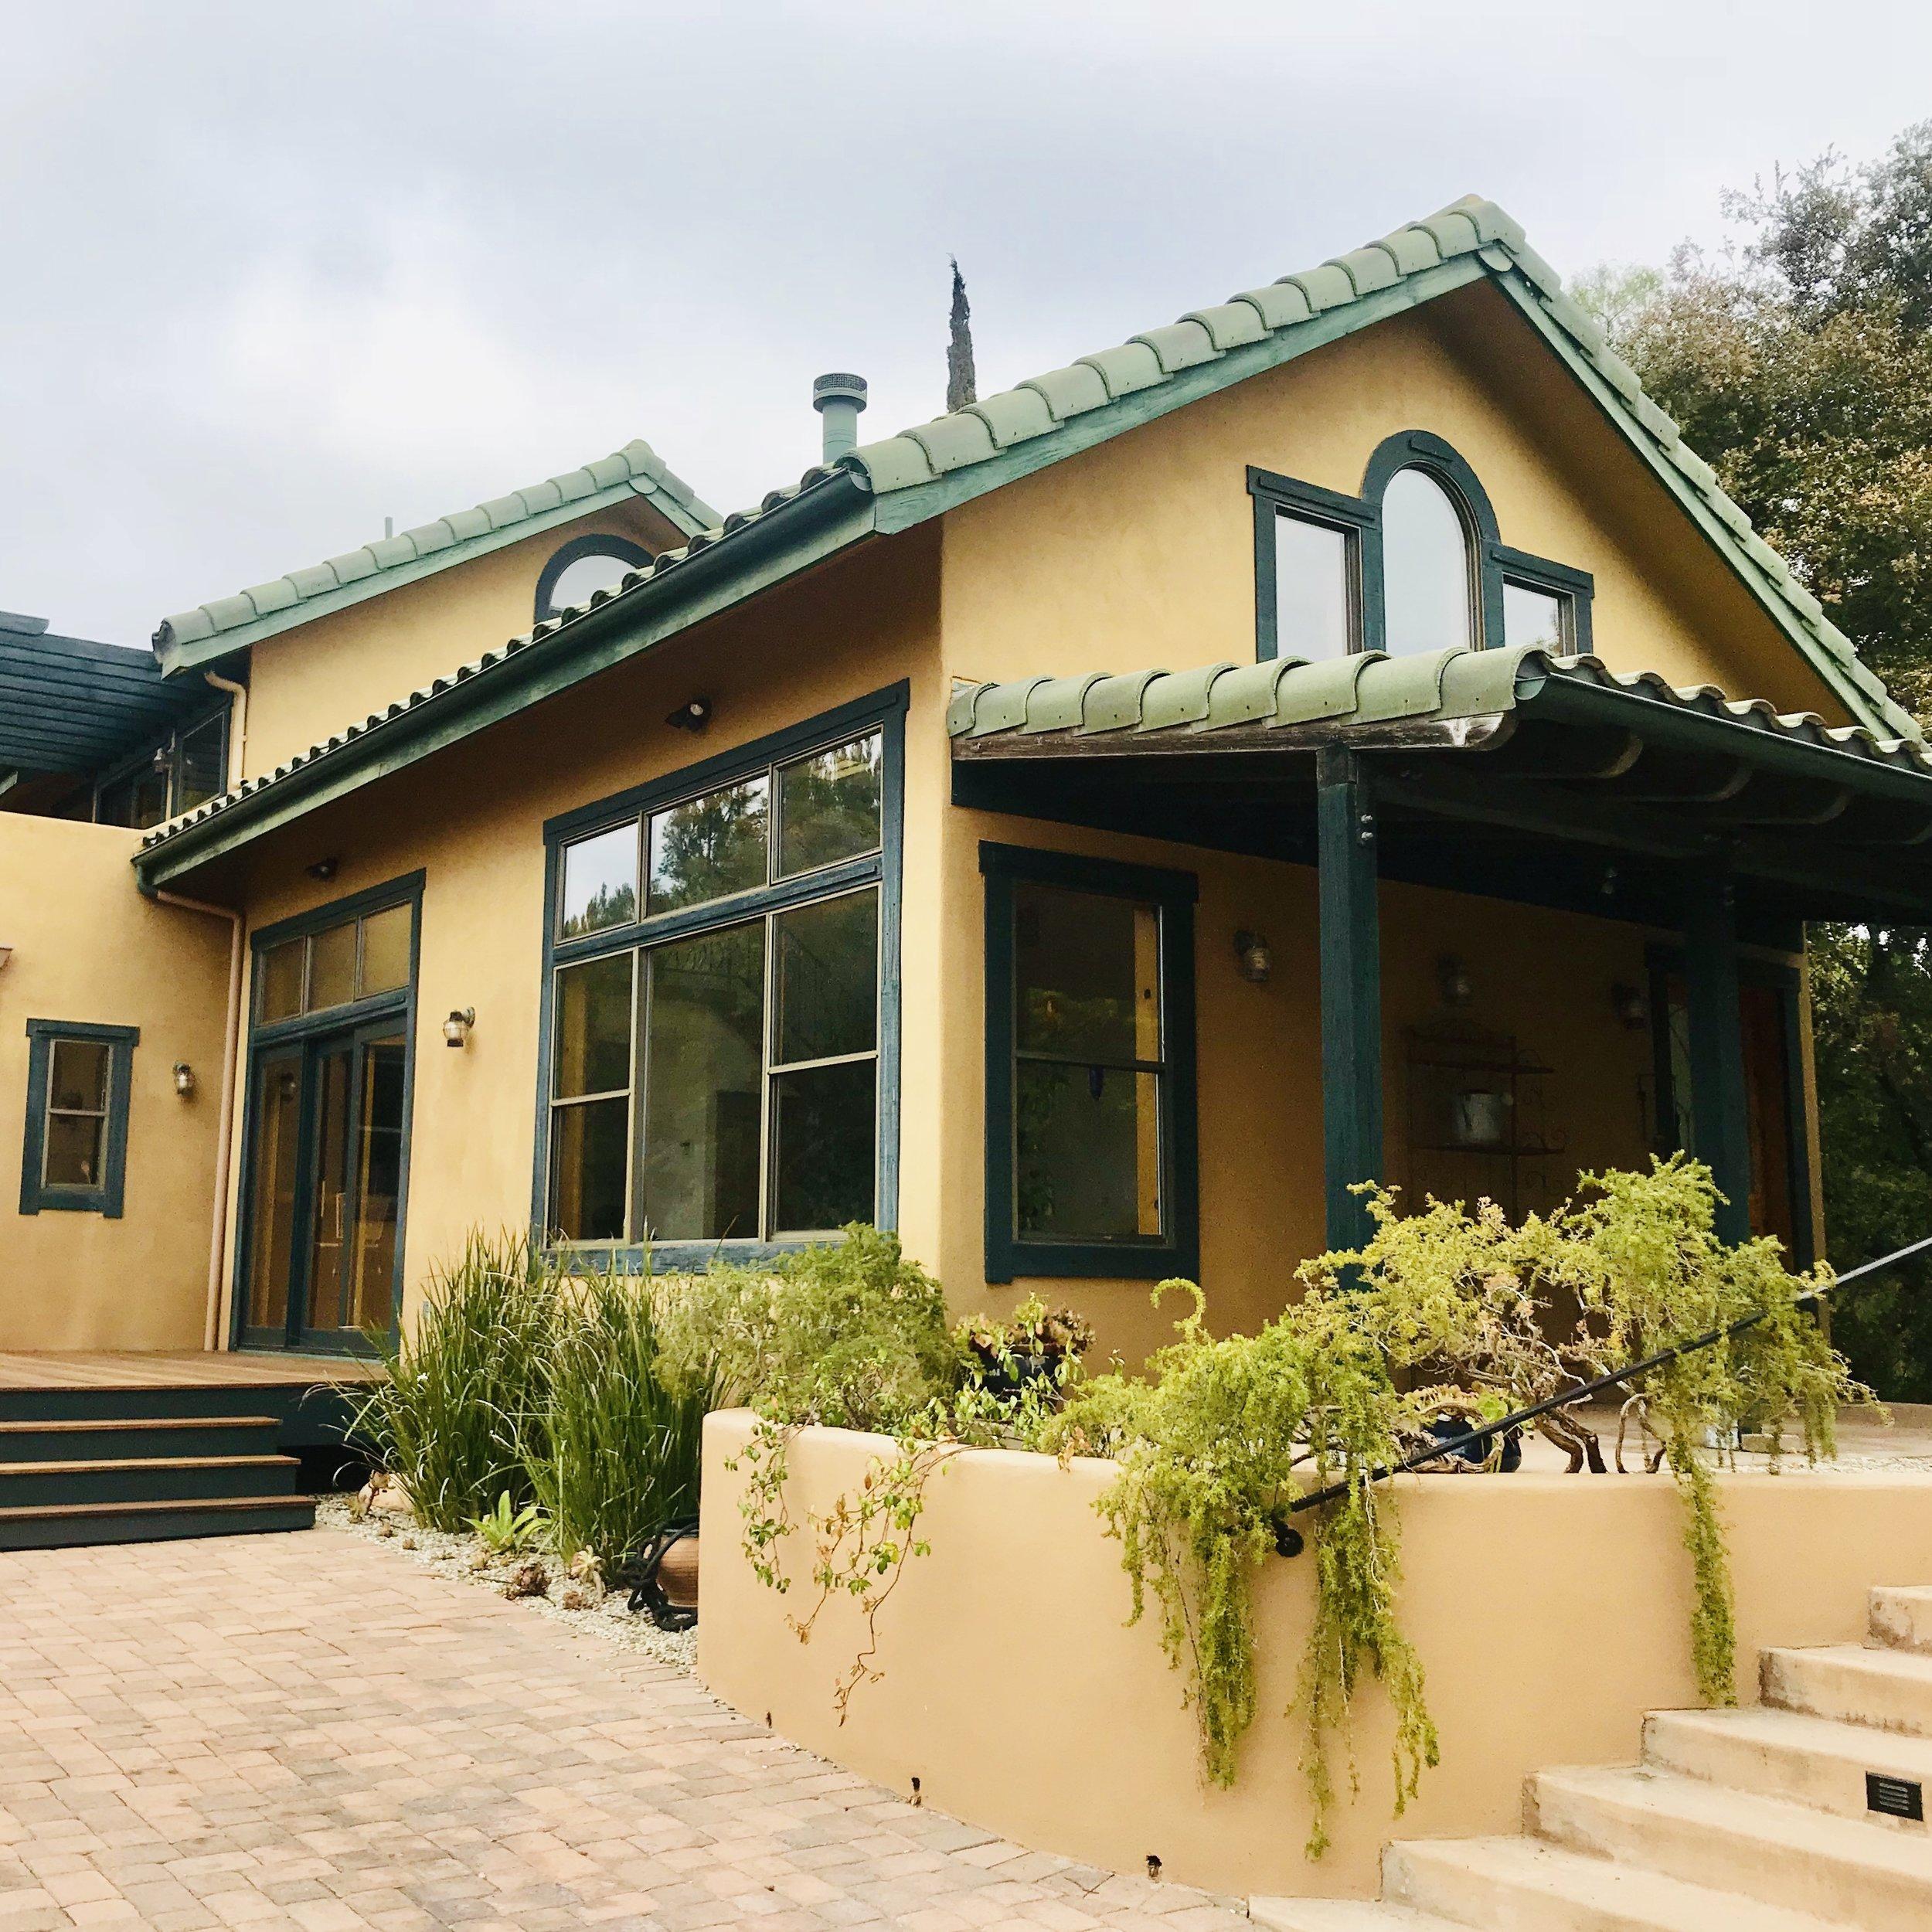 1577 Old Topanga Canyon Rd - Topanga$1,550,000Represented Buyers